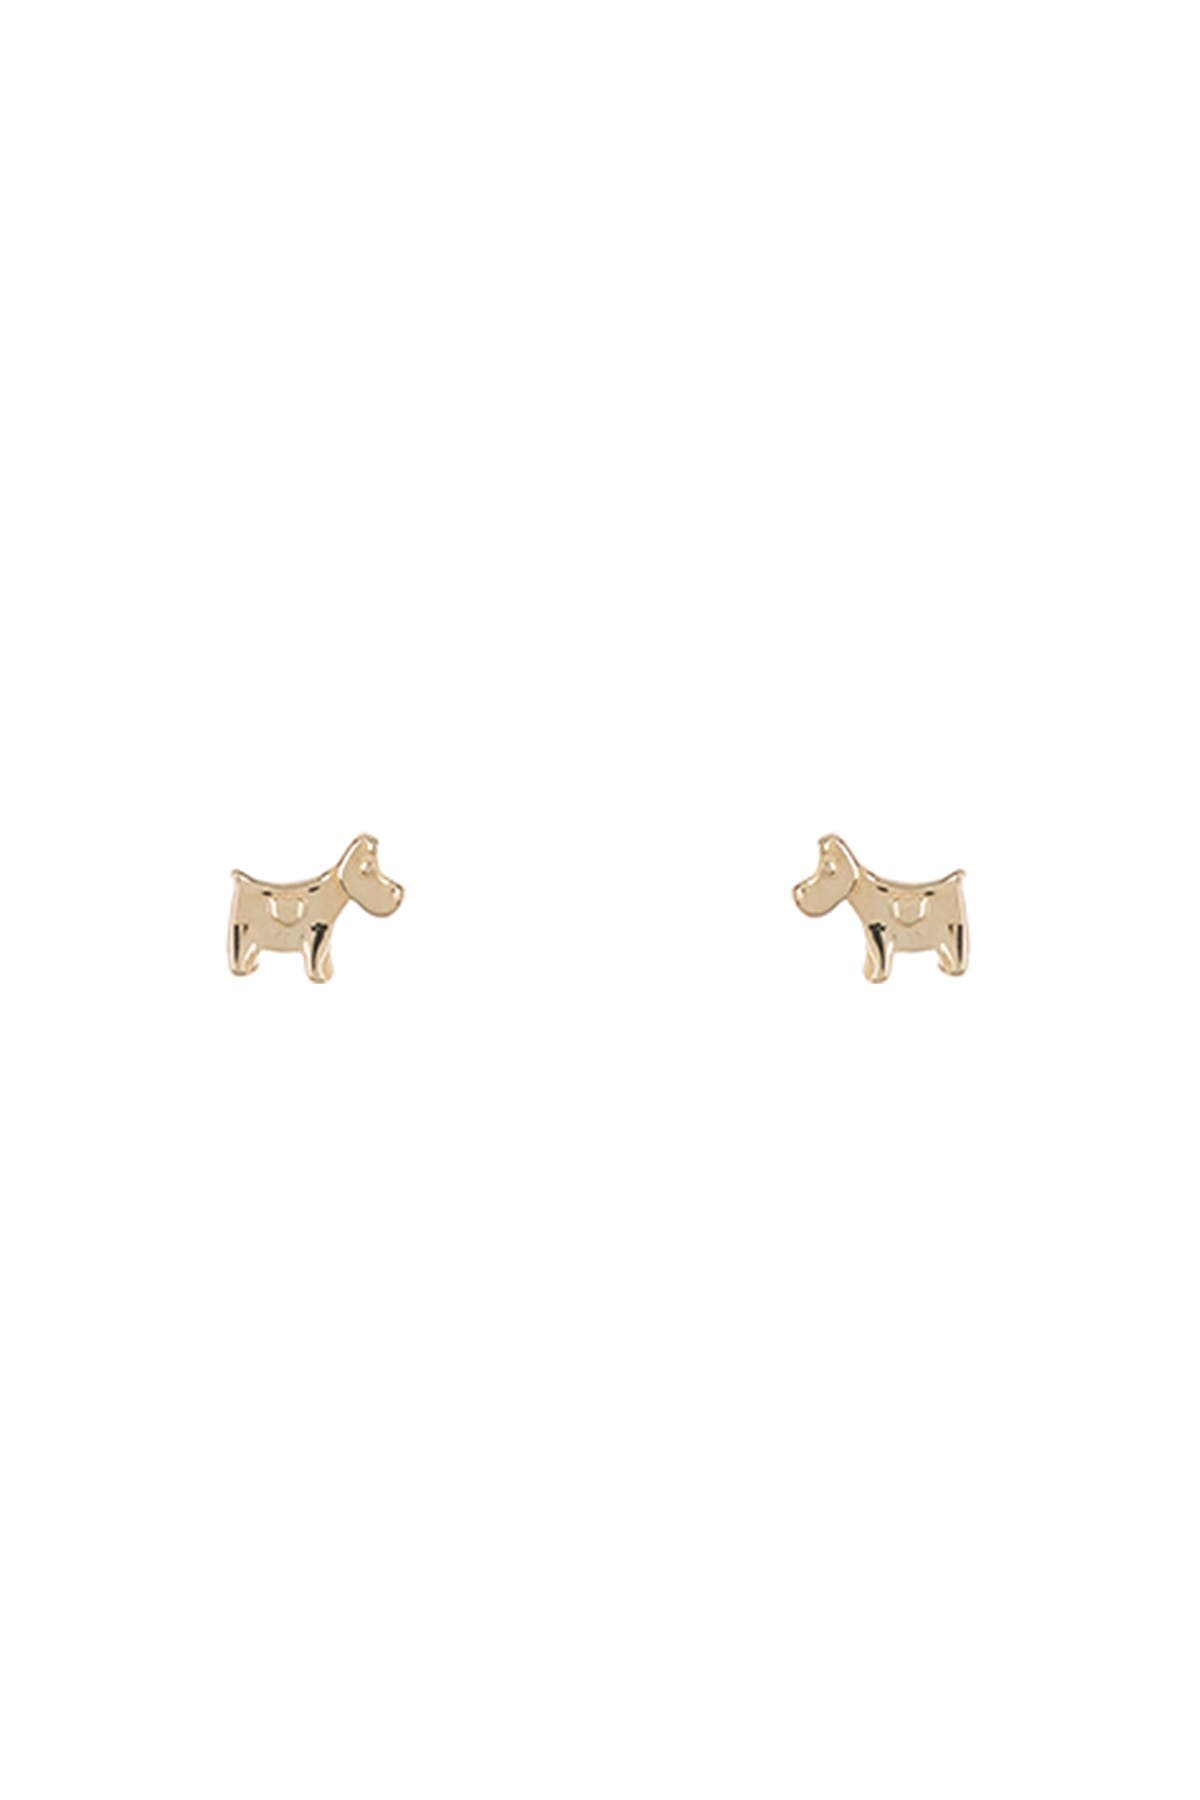 Image of KARAT RUSH 14K Yellow Gold Mini Dog Stud Earrings